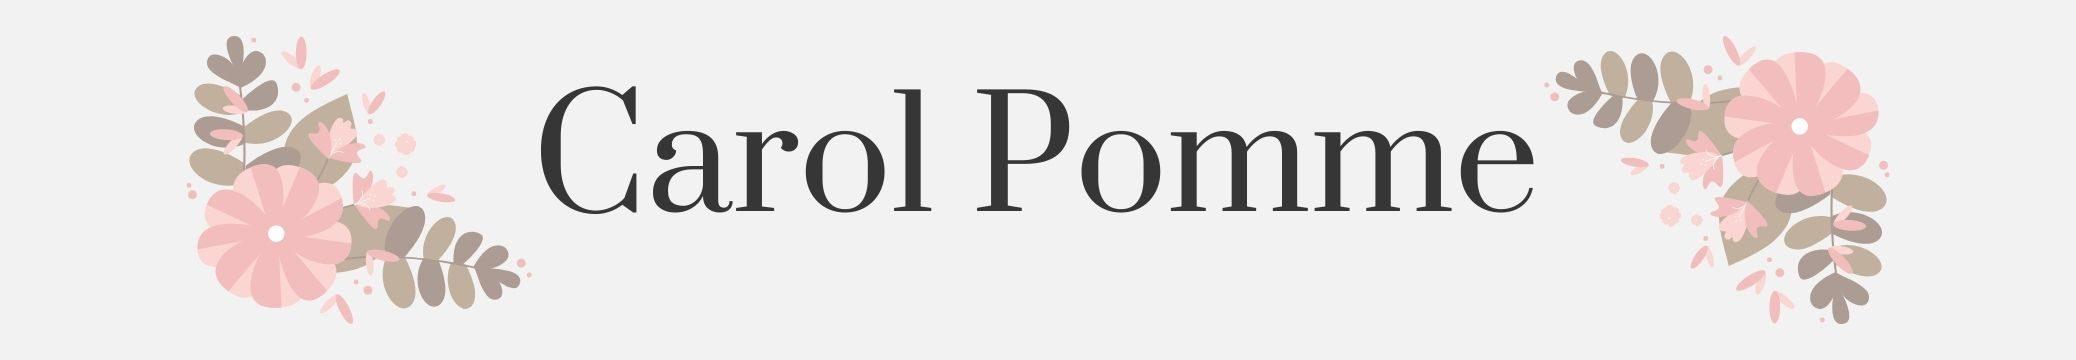 Carol Pomme